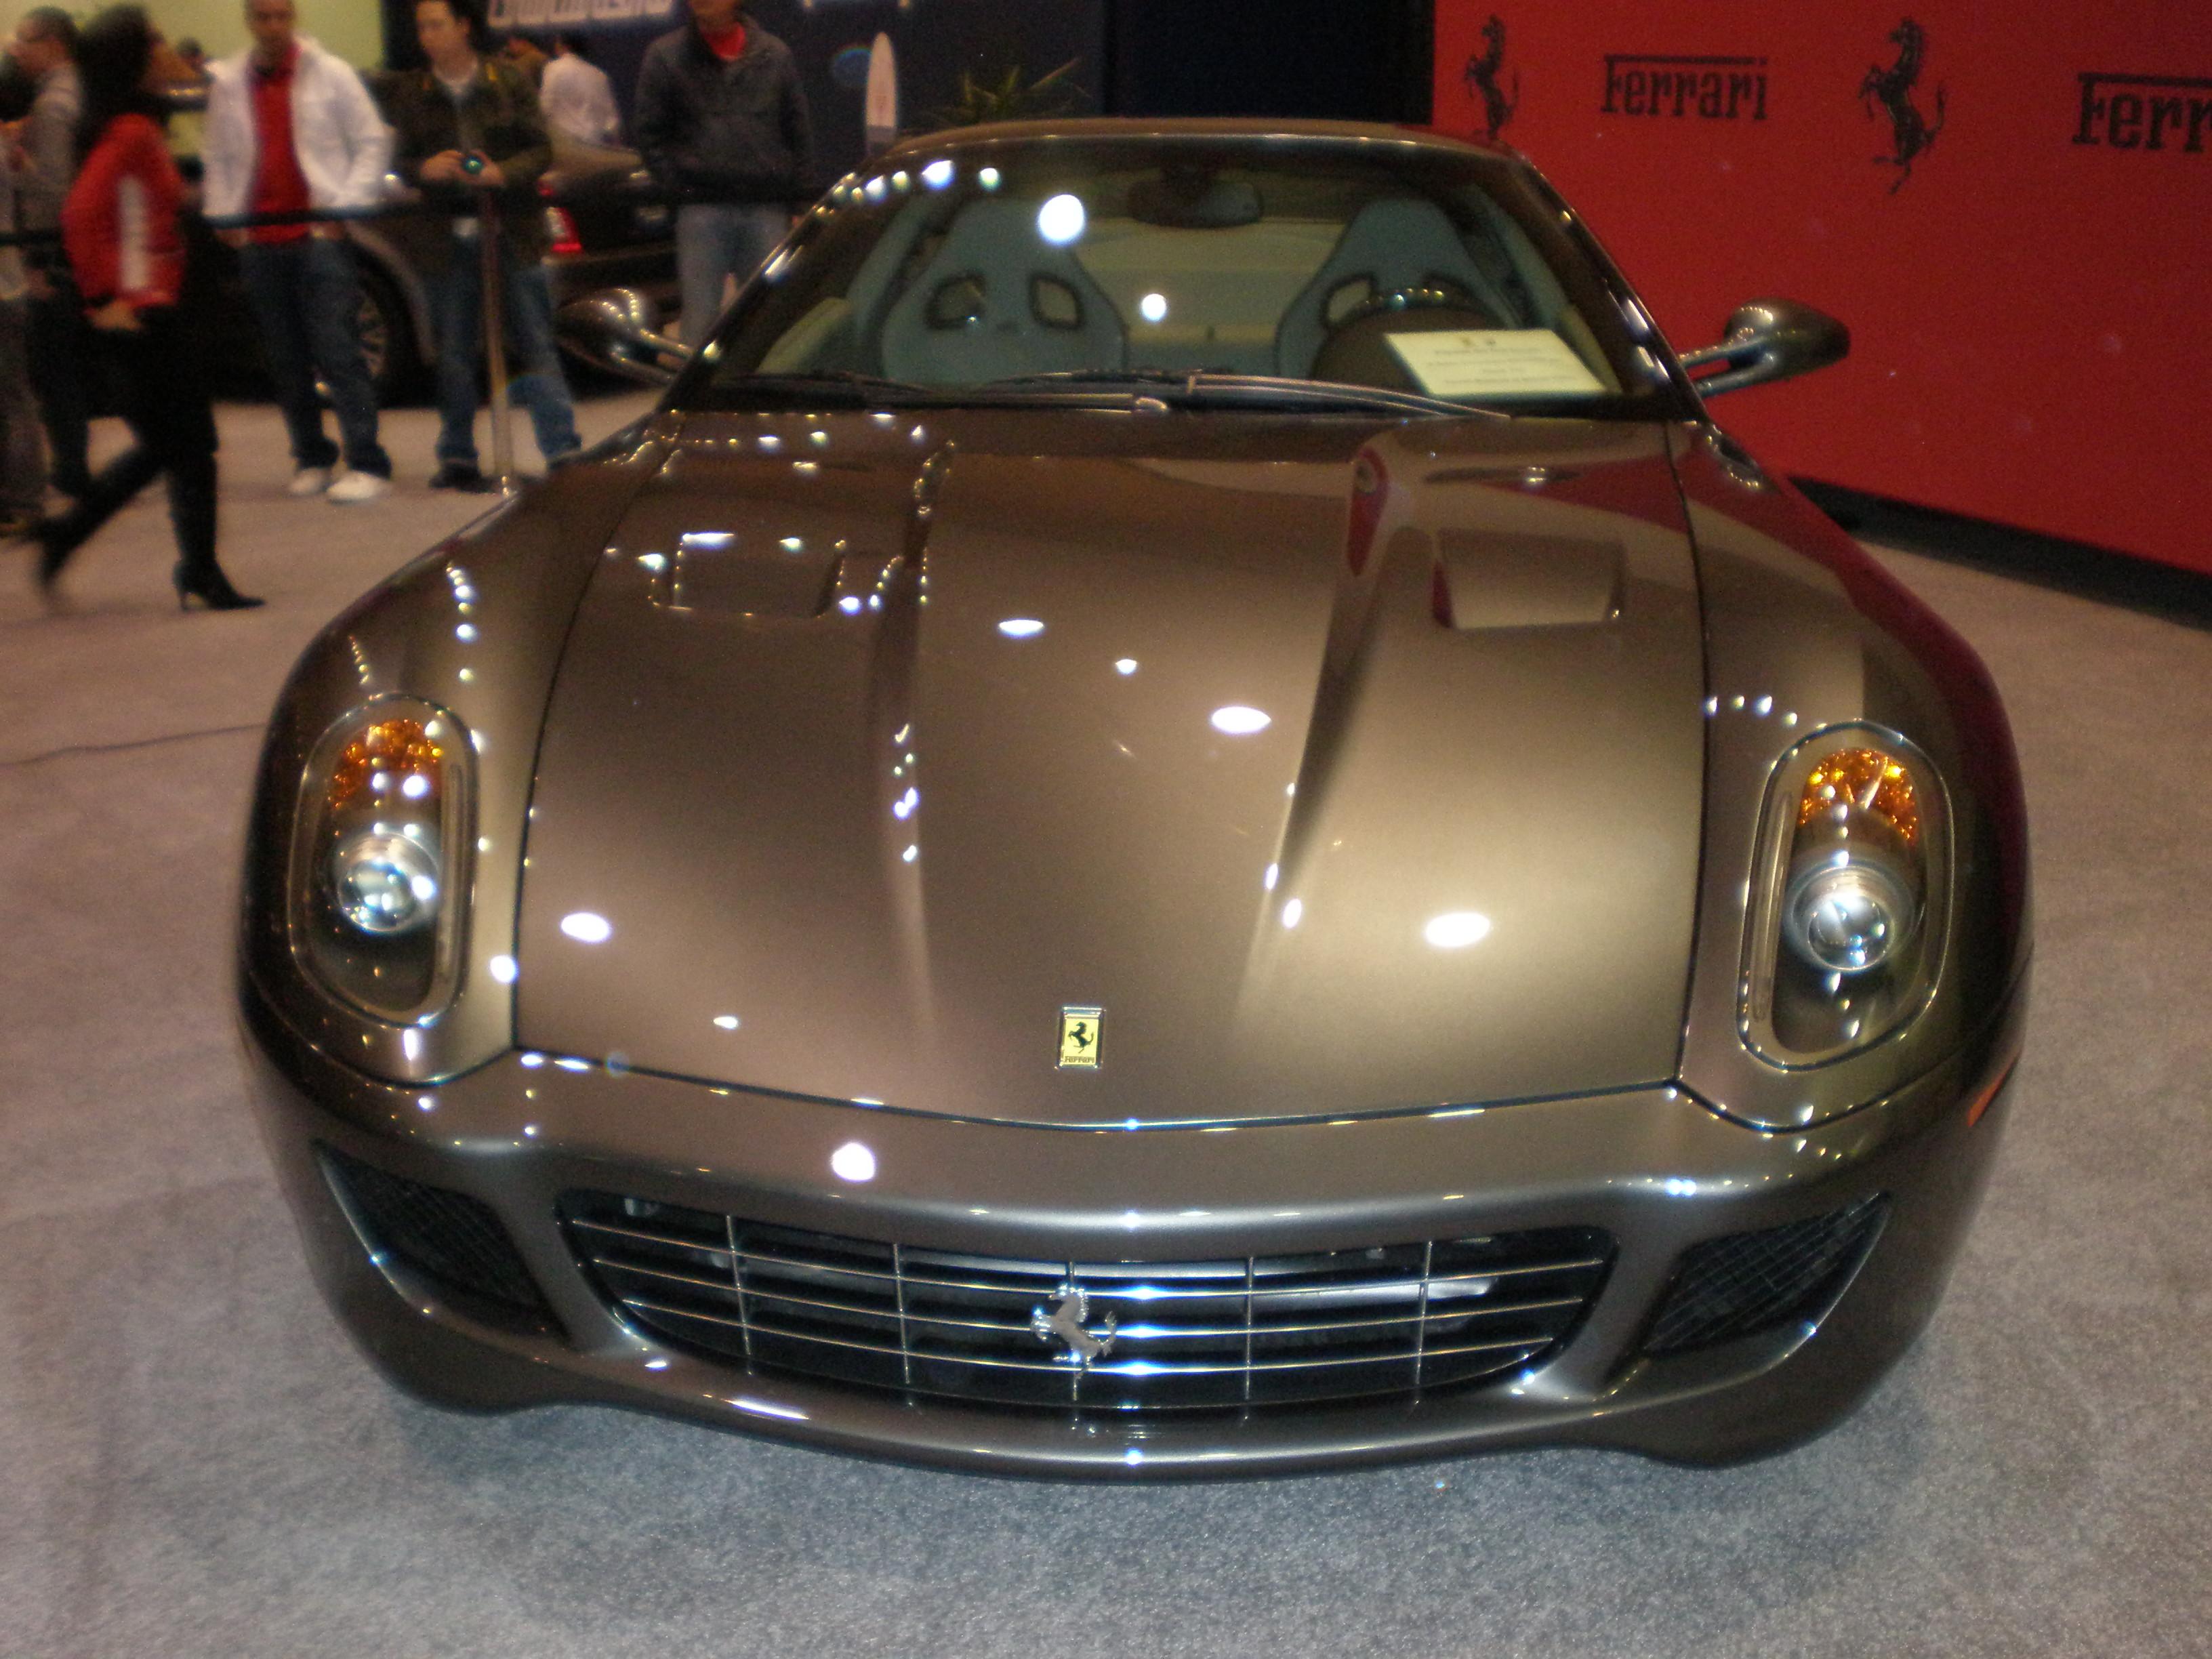 FERRARI 599 silver